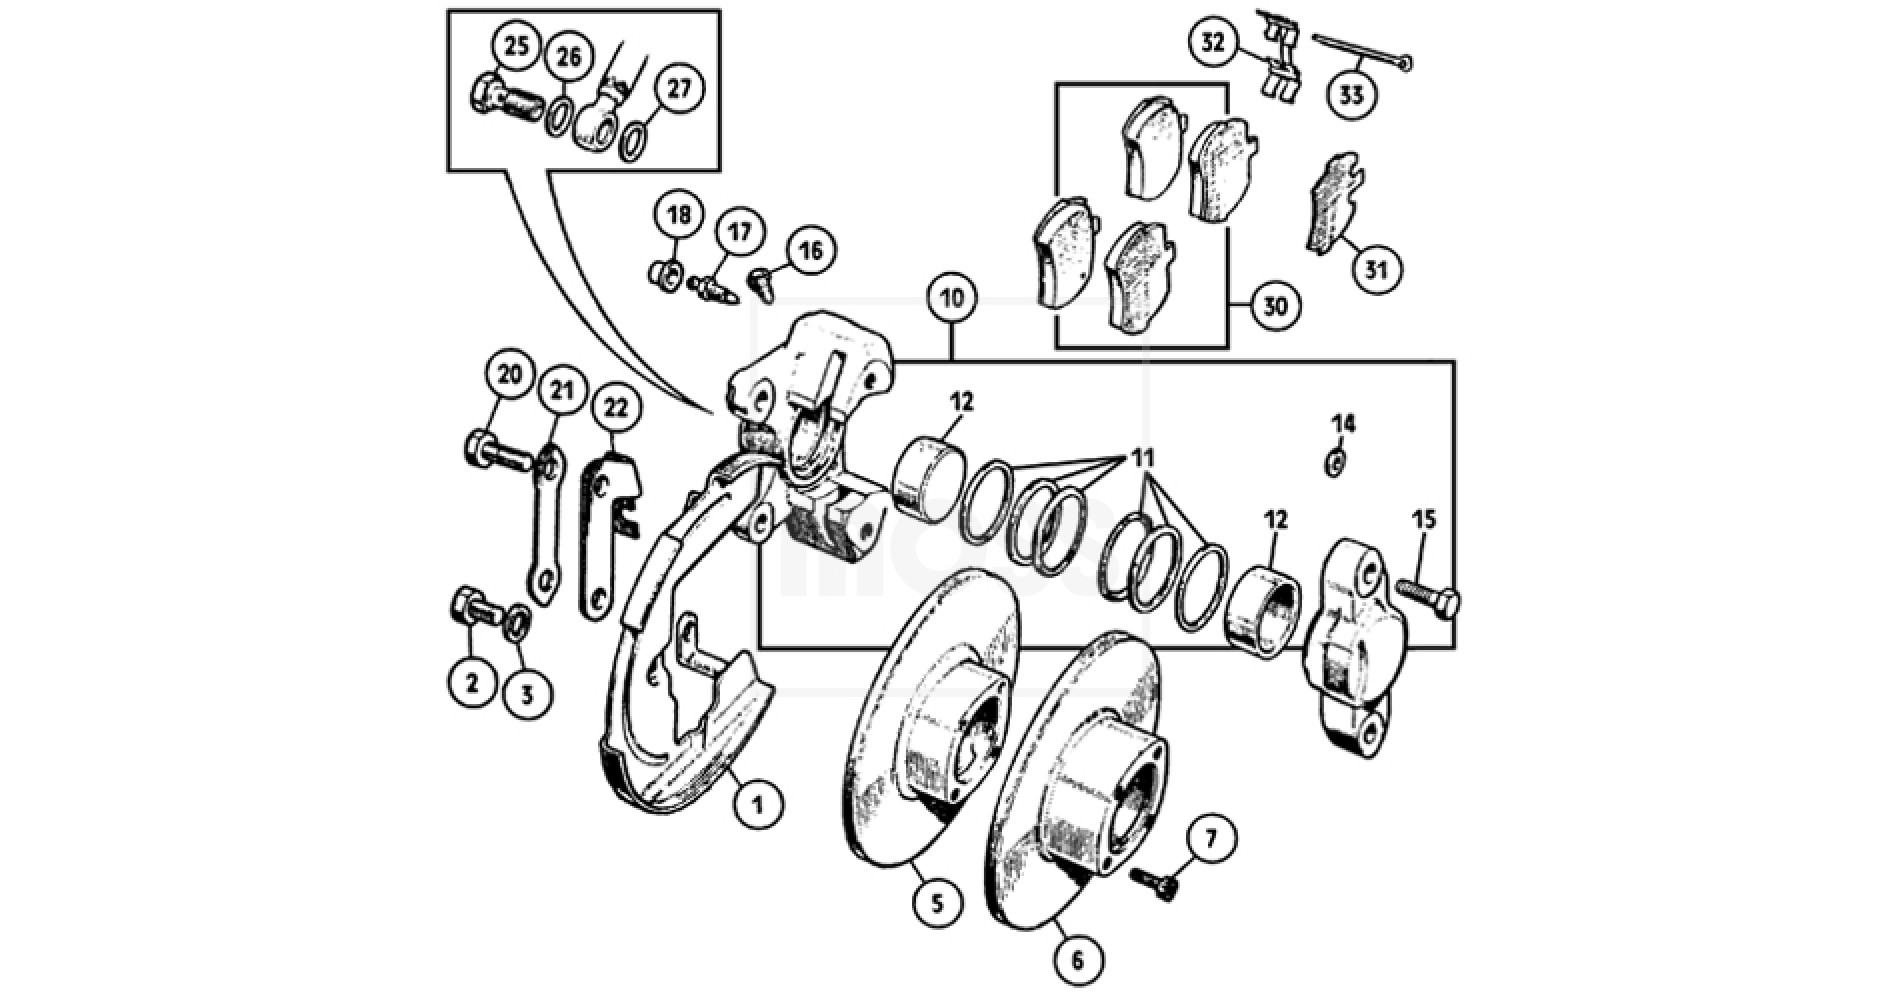 Midget Brakes FRONT BRAKES Front Brakes Sprite & Midget